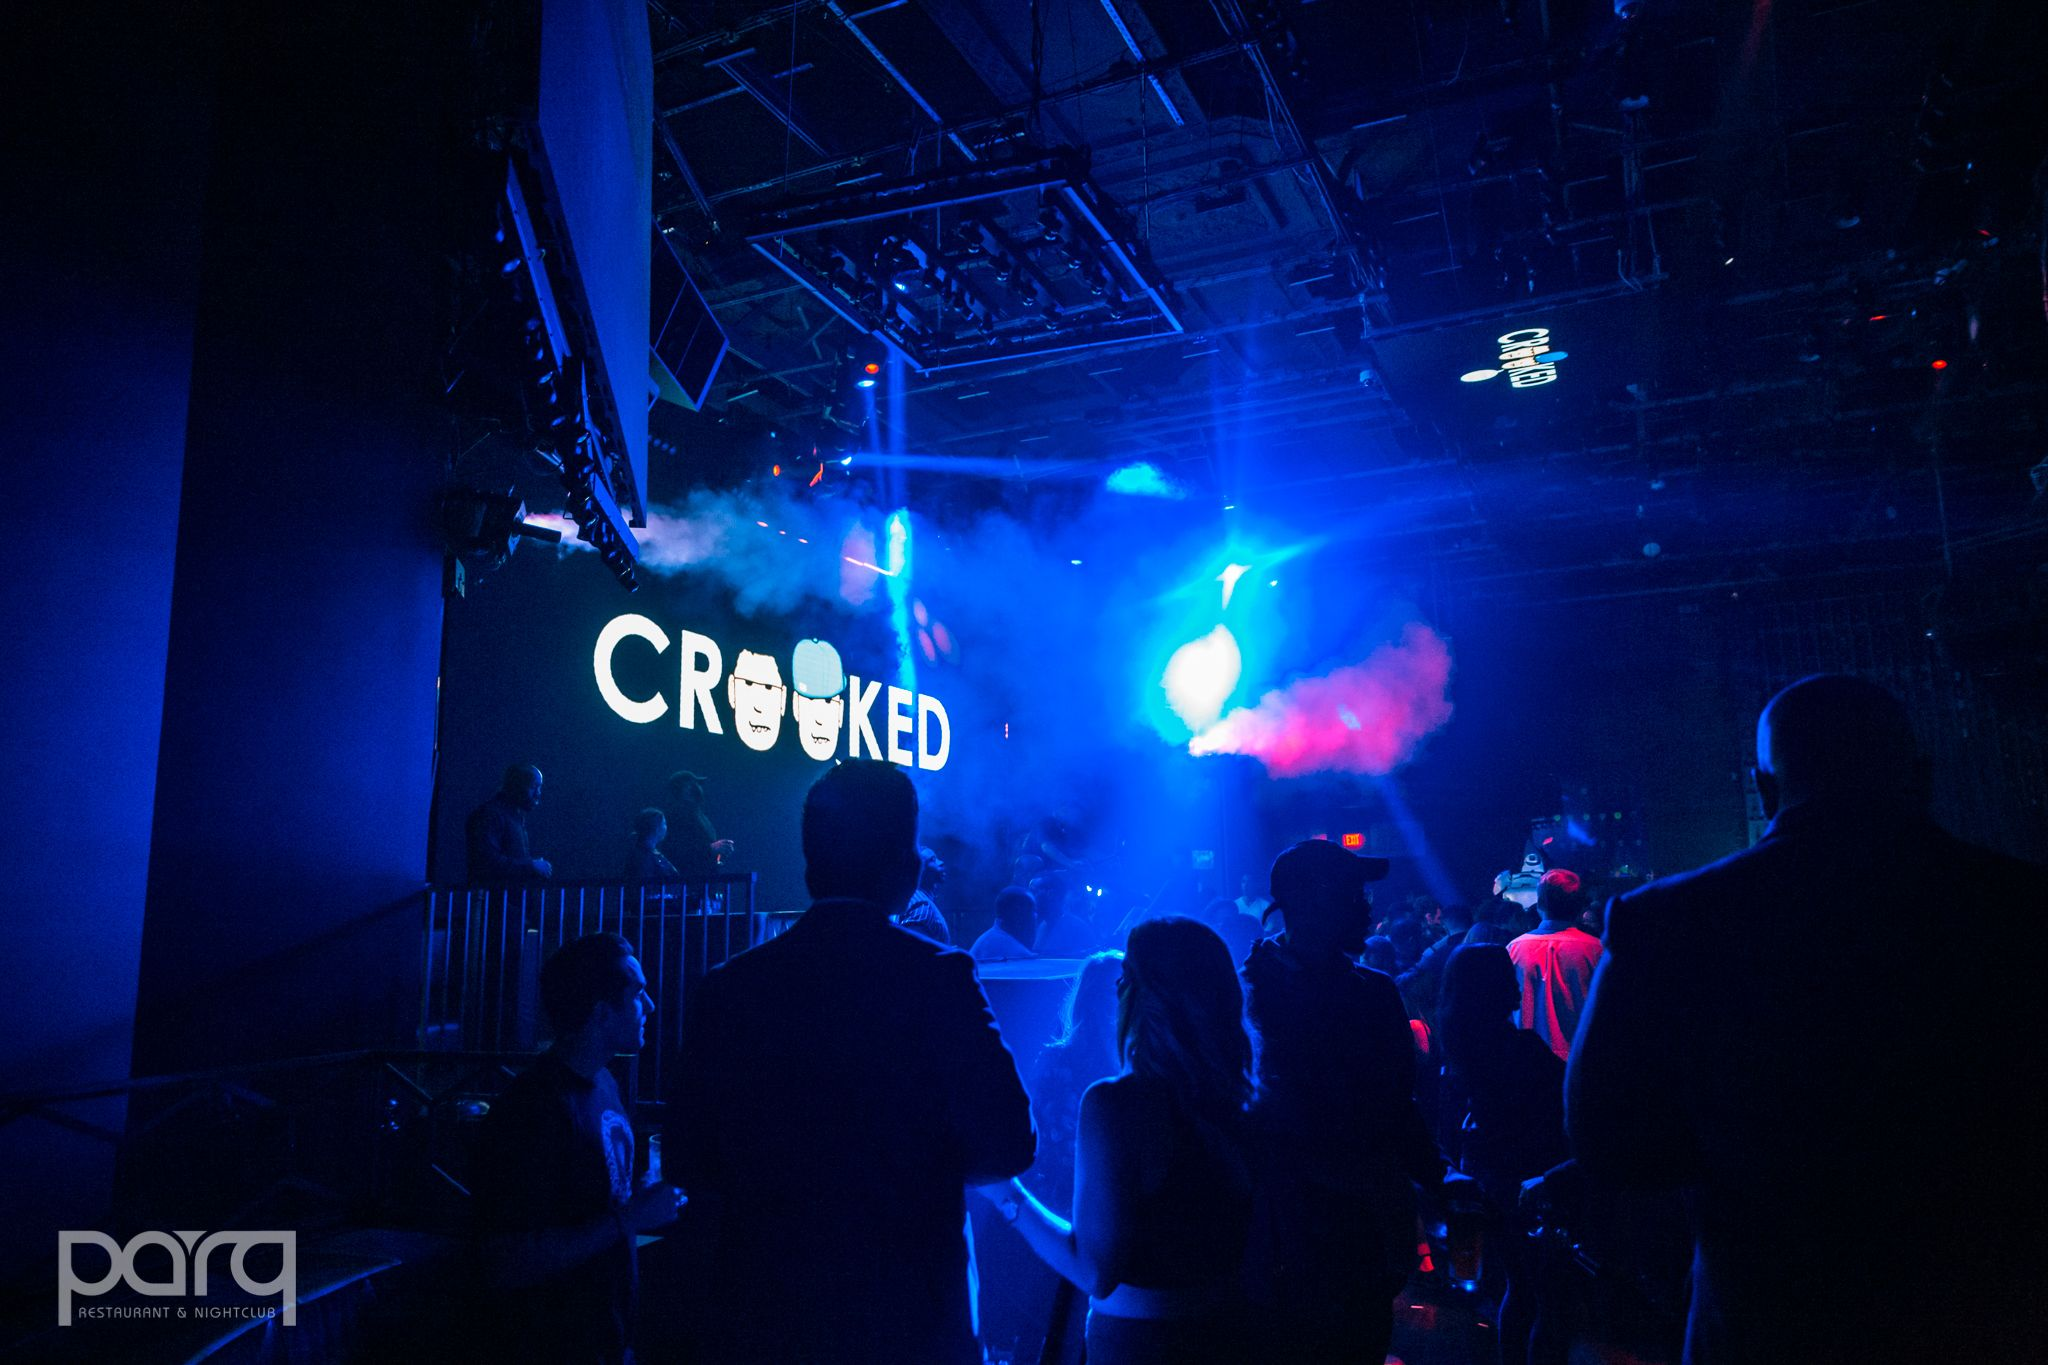 12.07.18 Parq - Crooked-18.jpg